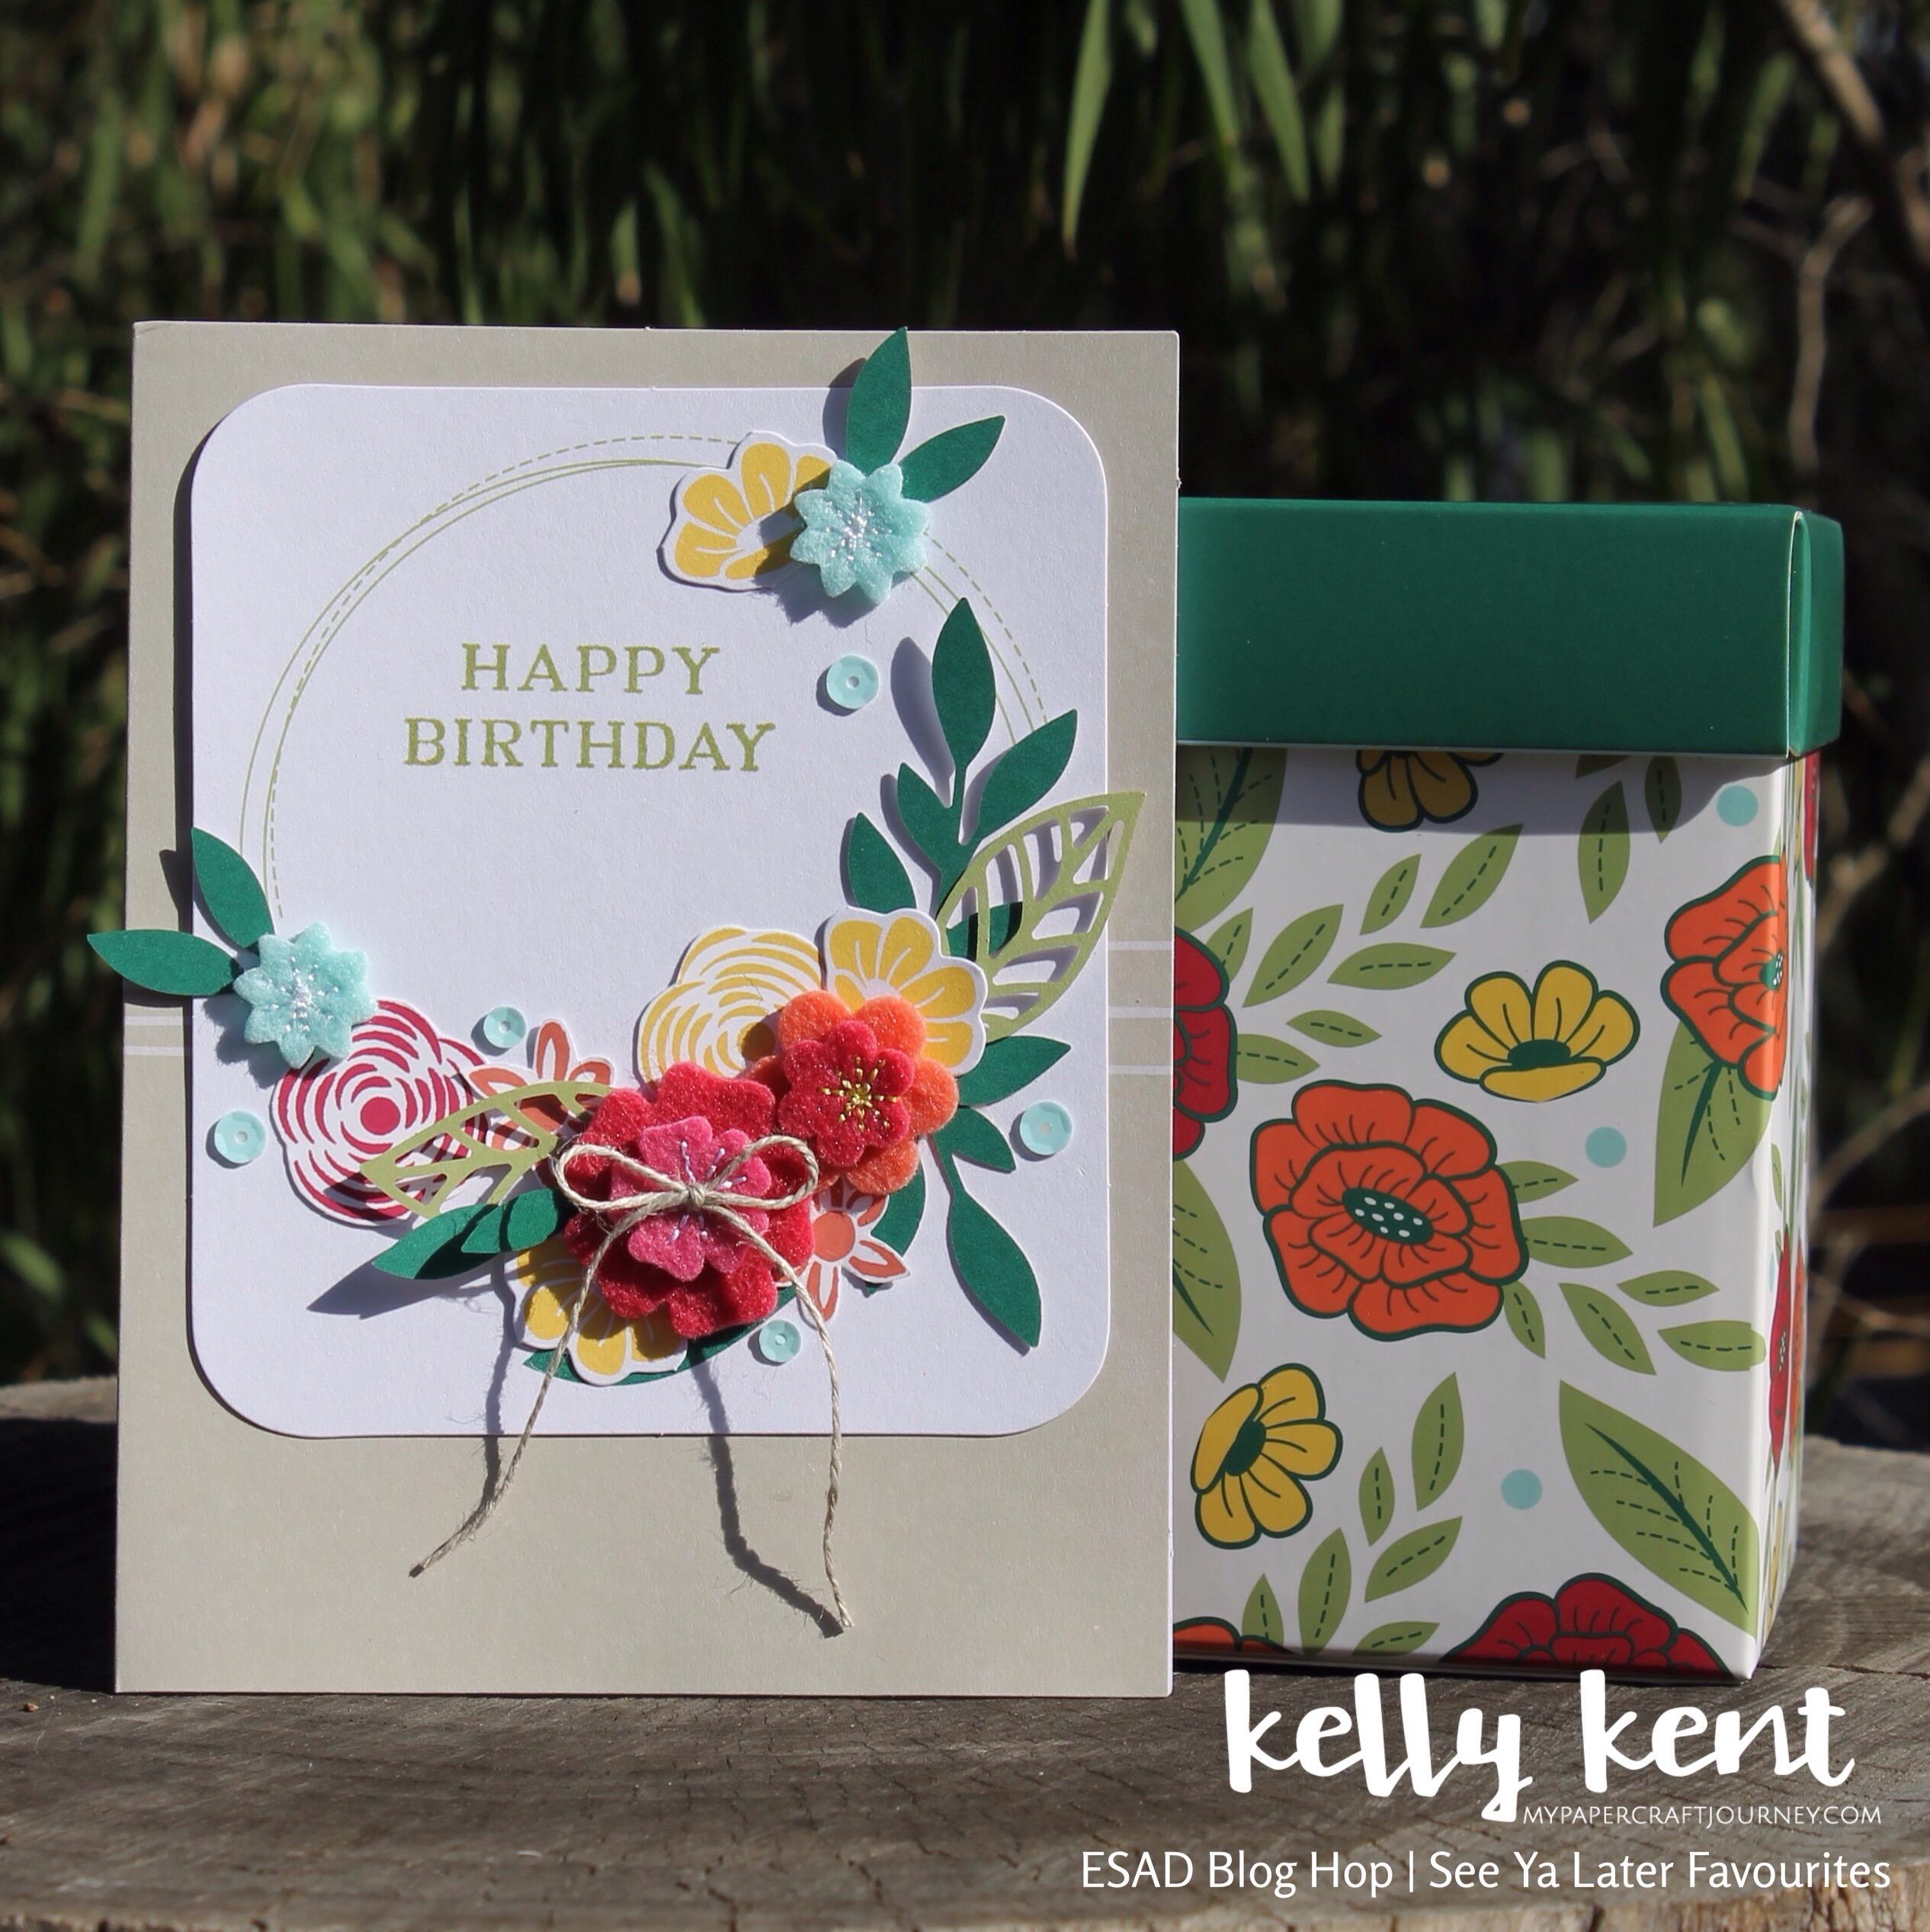 For the Love of Felt | kelly kent